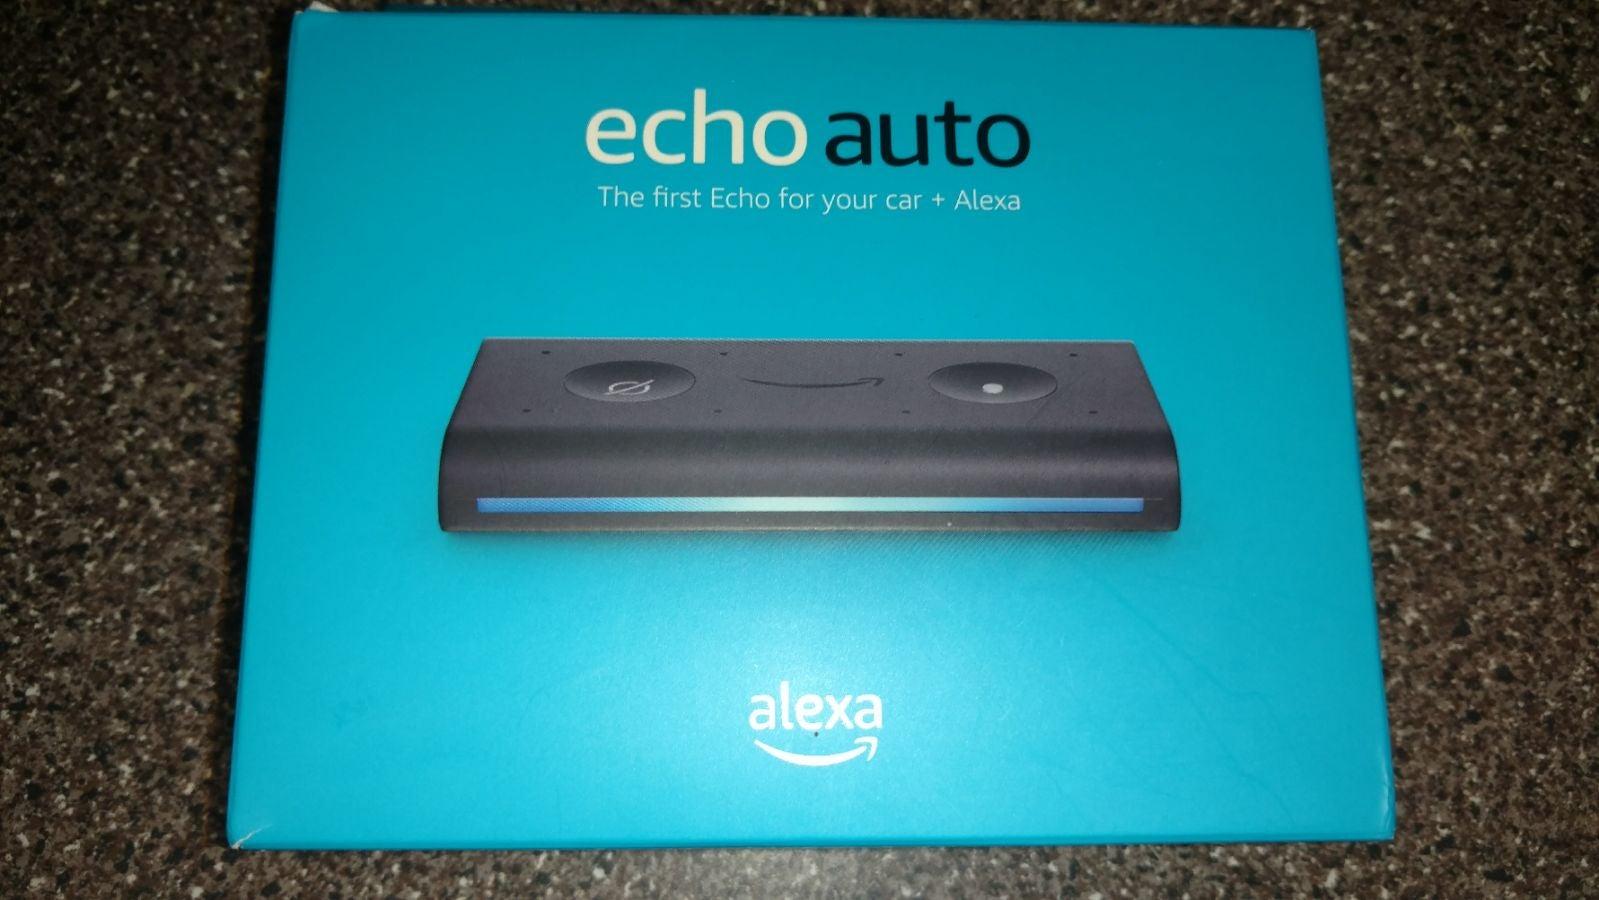 alexa Amazon echo, Auto for your car